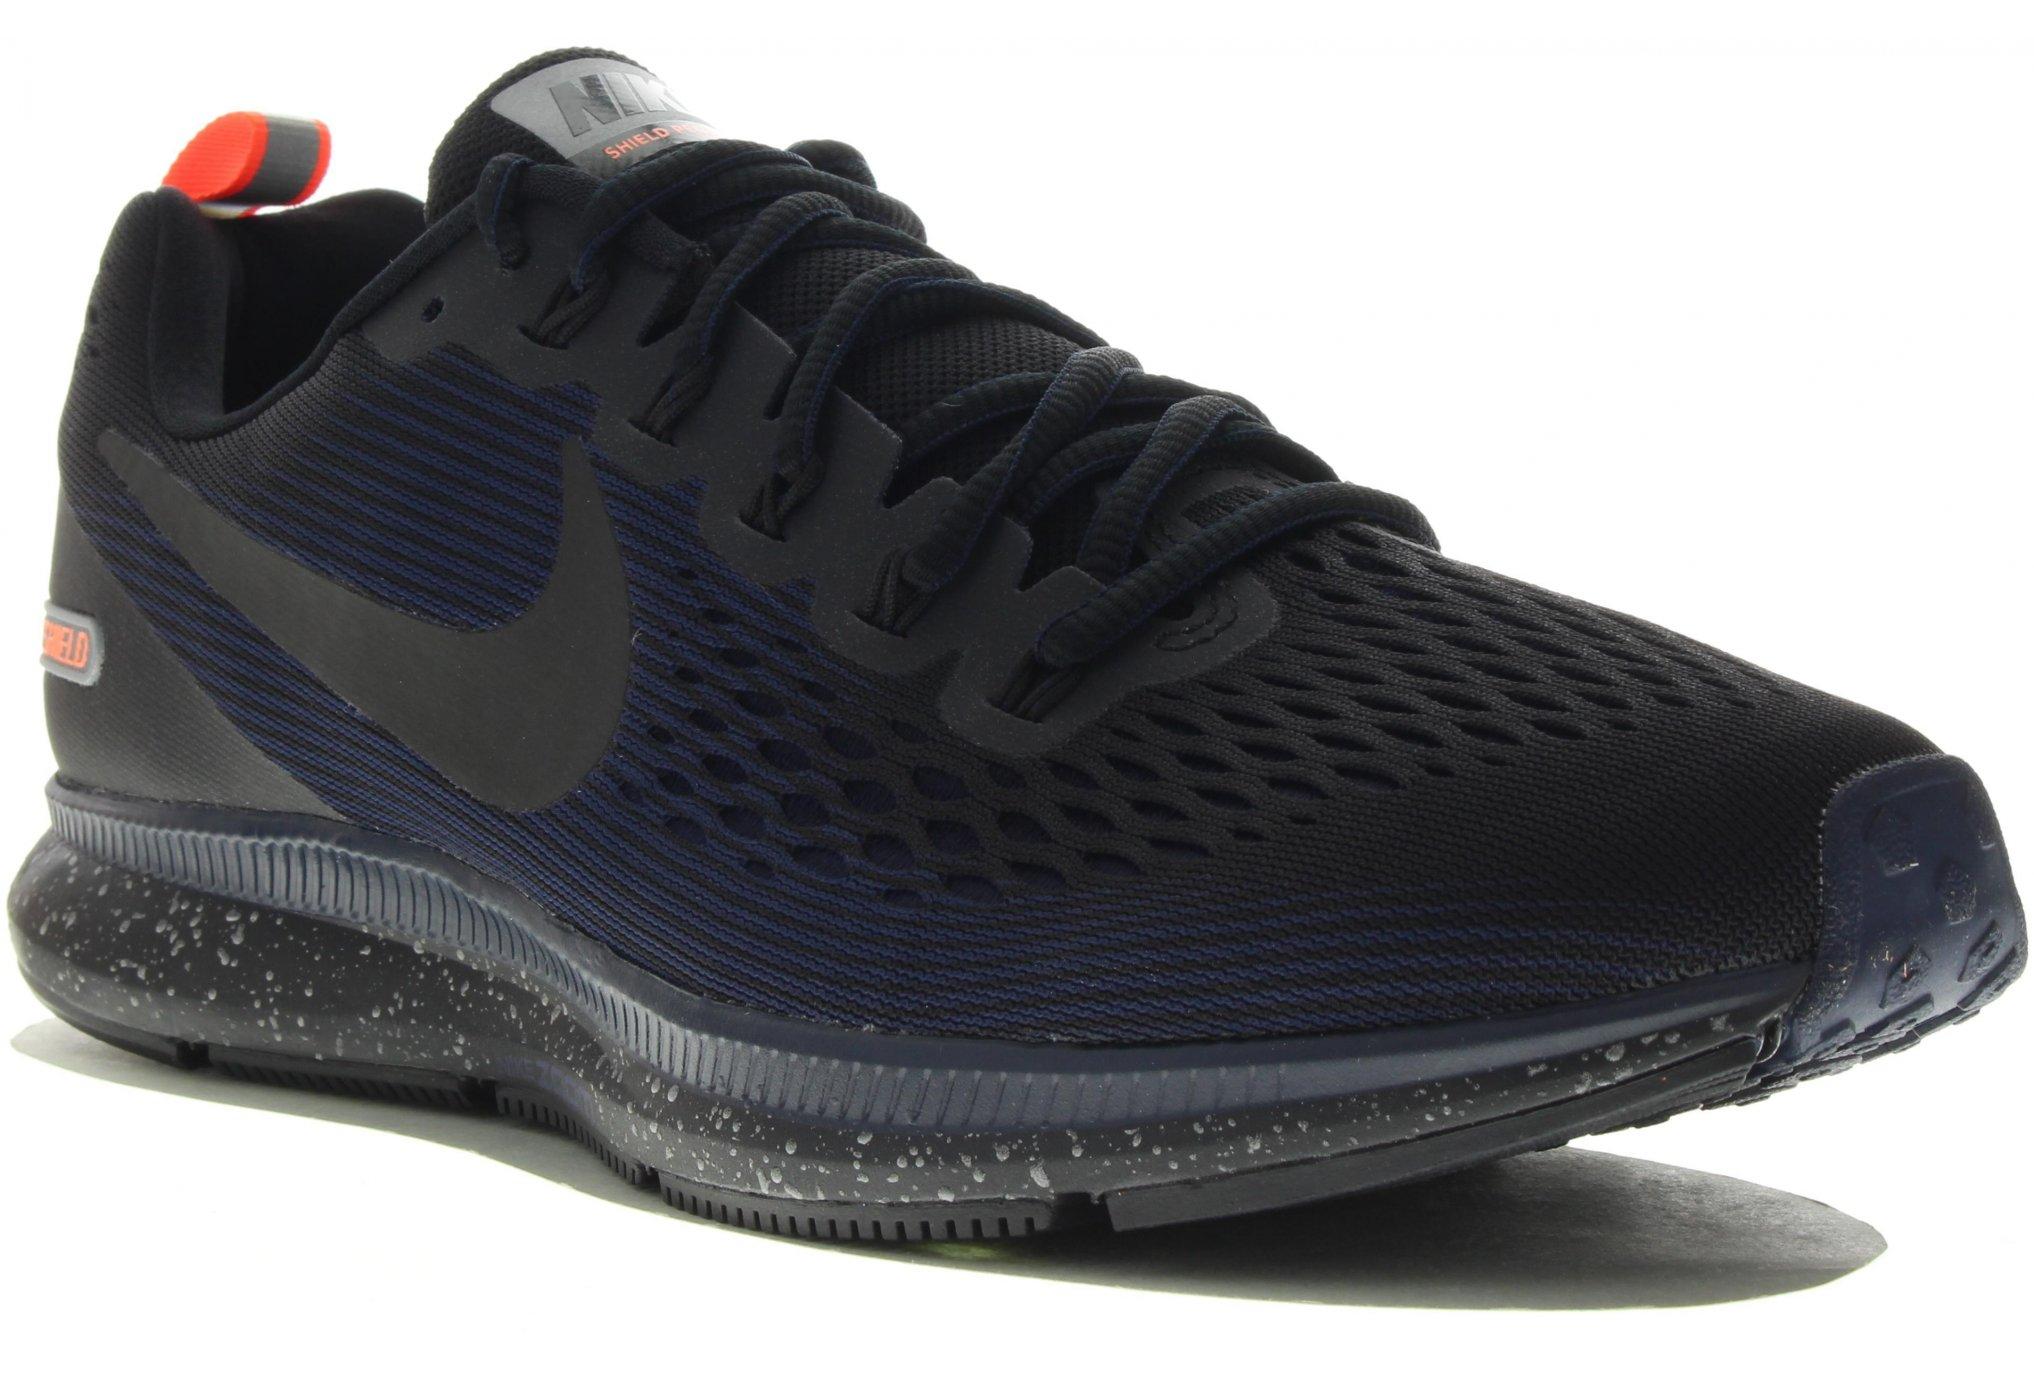 Chaussures de running Nike Air Zoom Pegasus 34 Shield